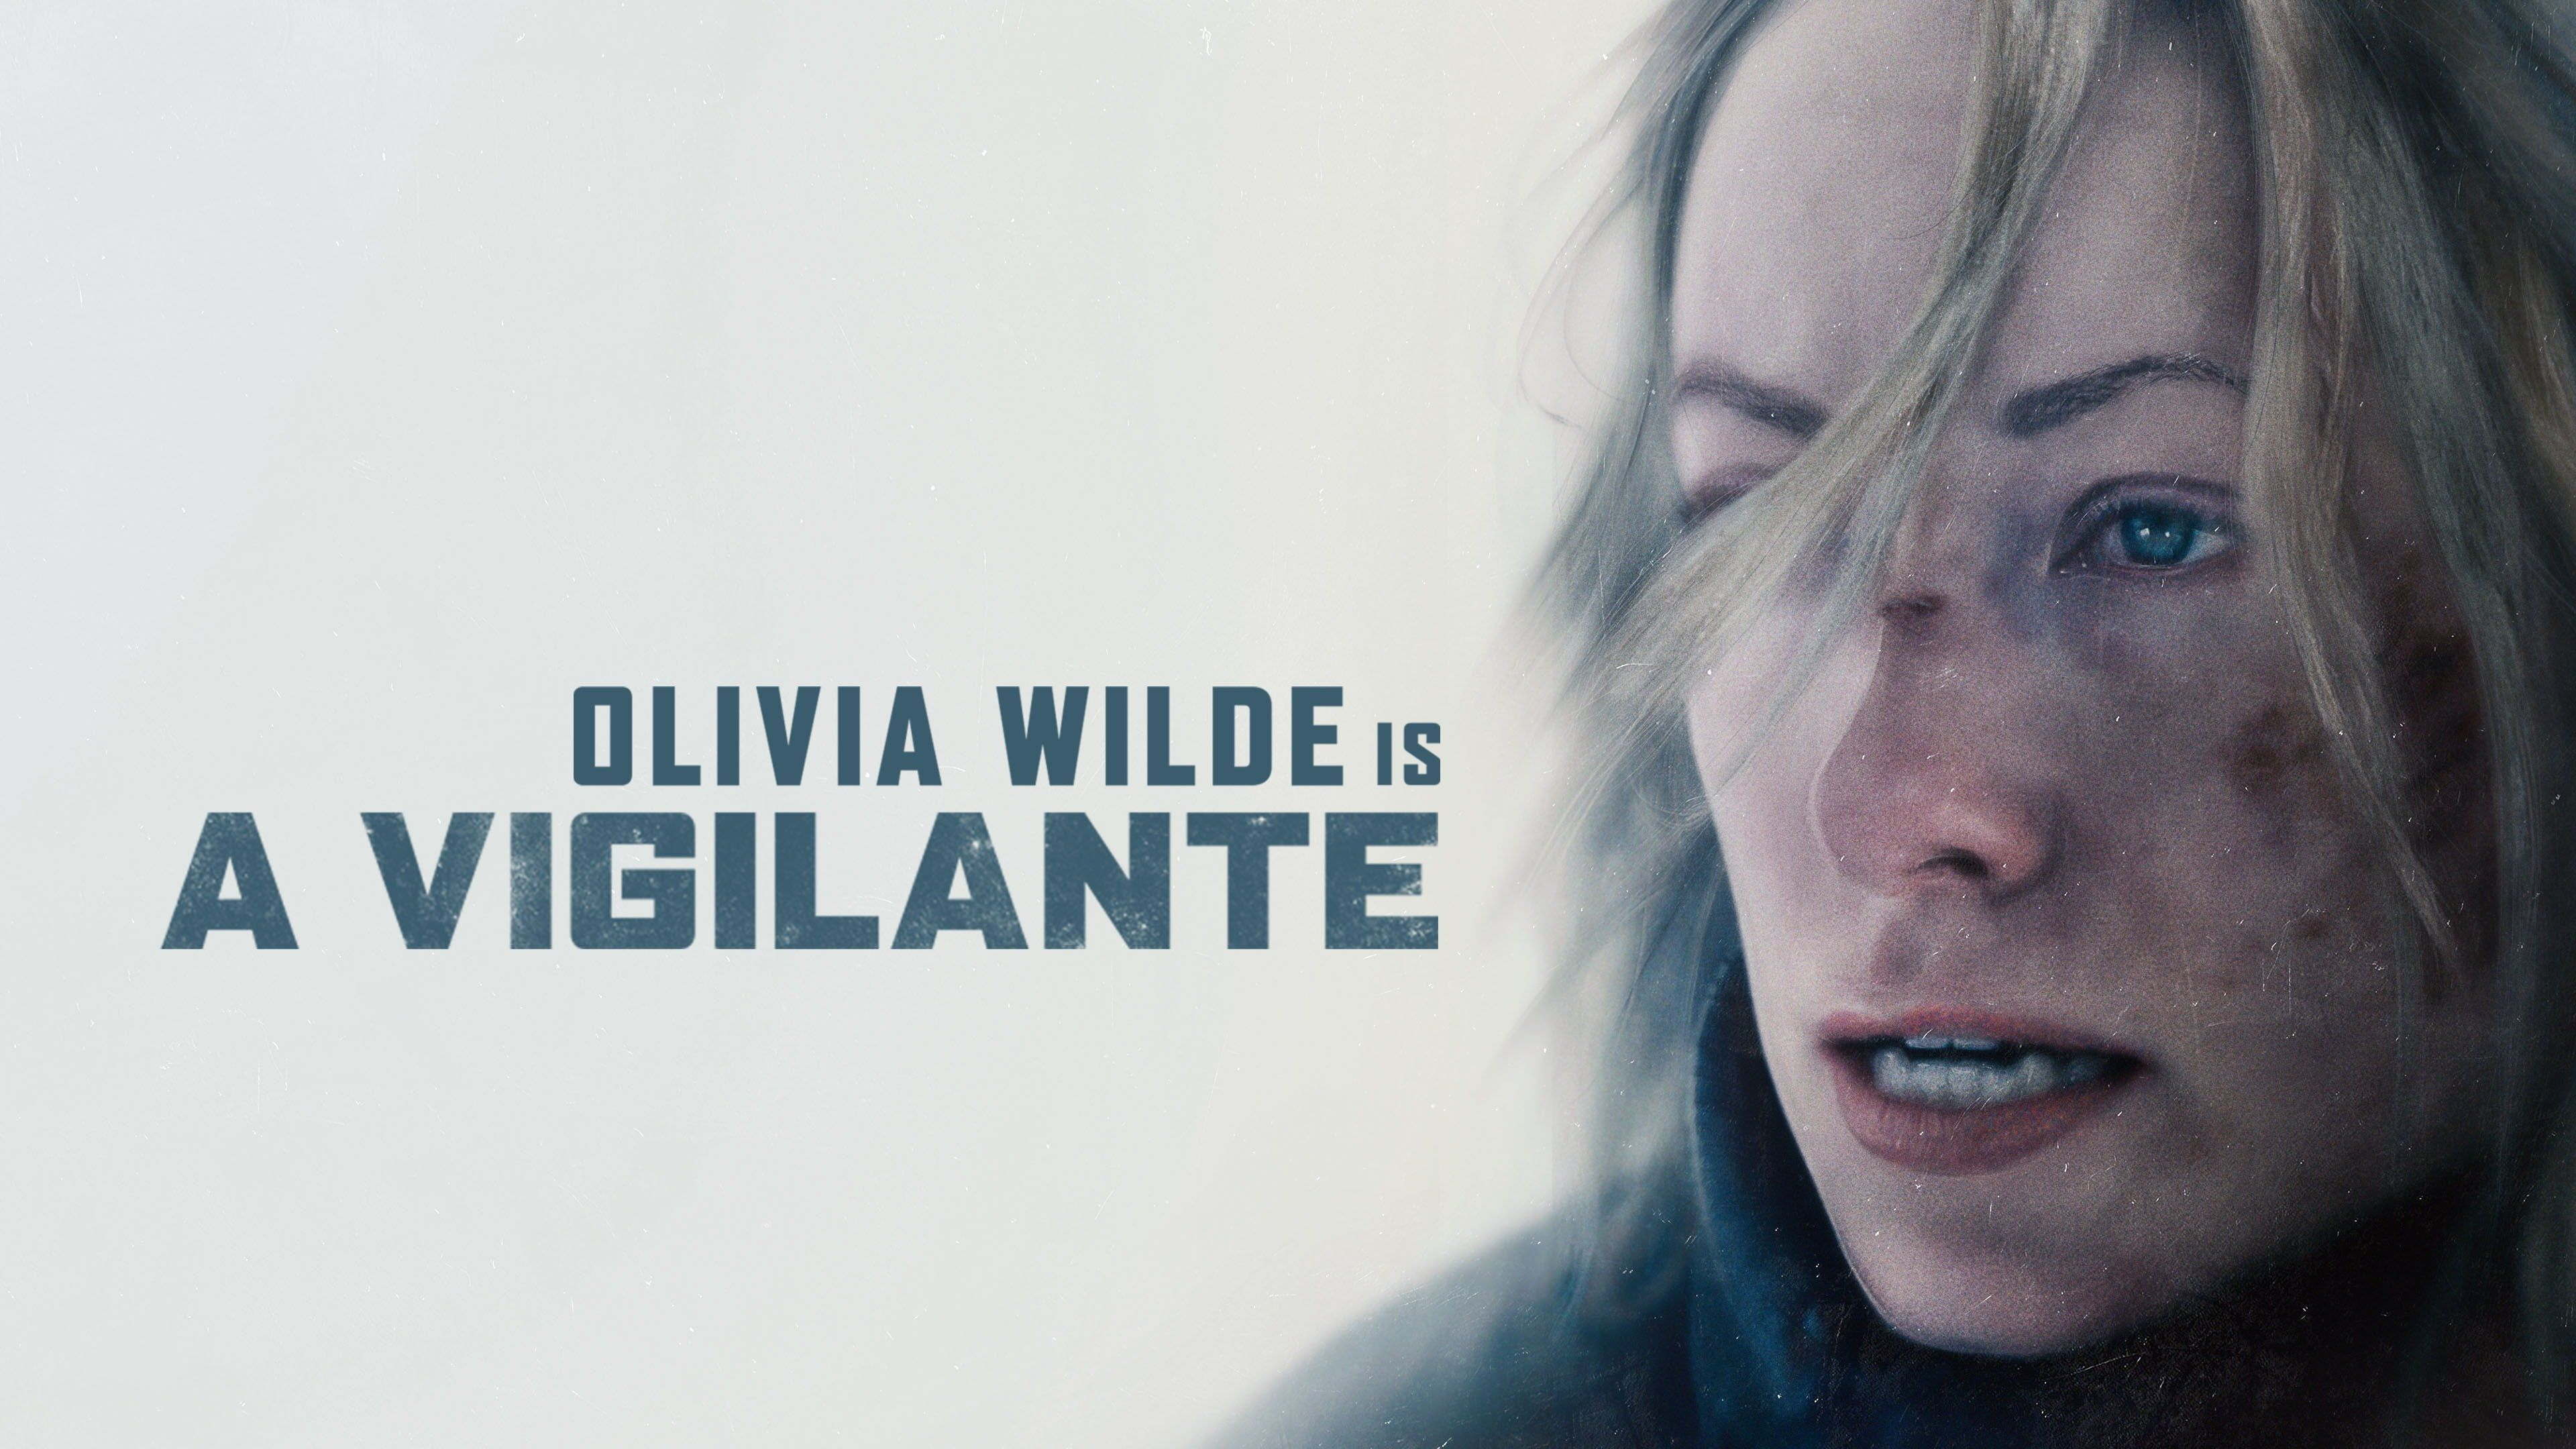 A Vigilante 2019 Online Teljes Film Filmek Magyarul Letoltes Hd Free Movies Online Streaming Movies Free New Movies To Watch